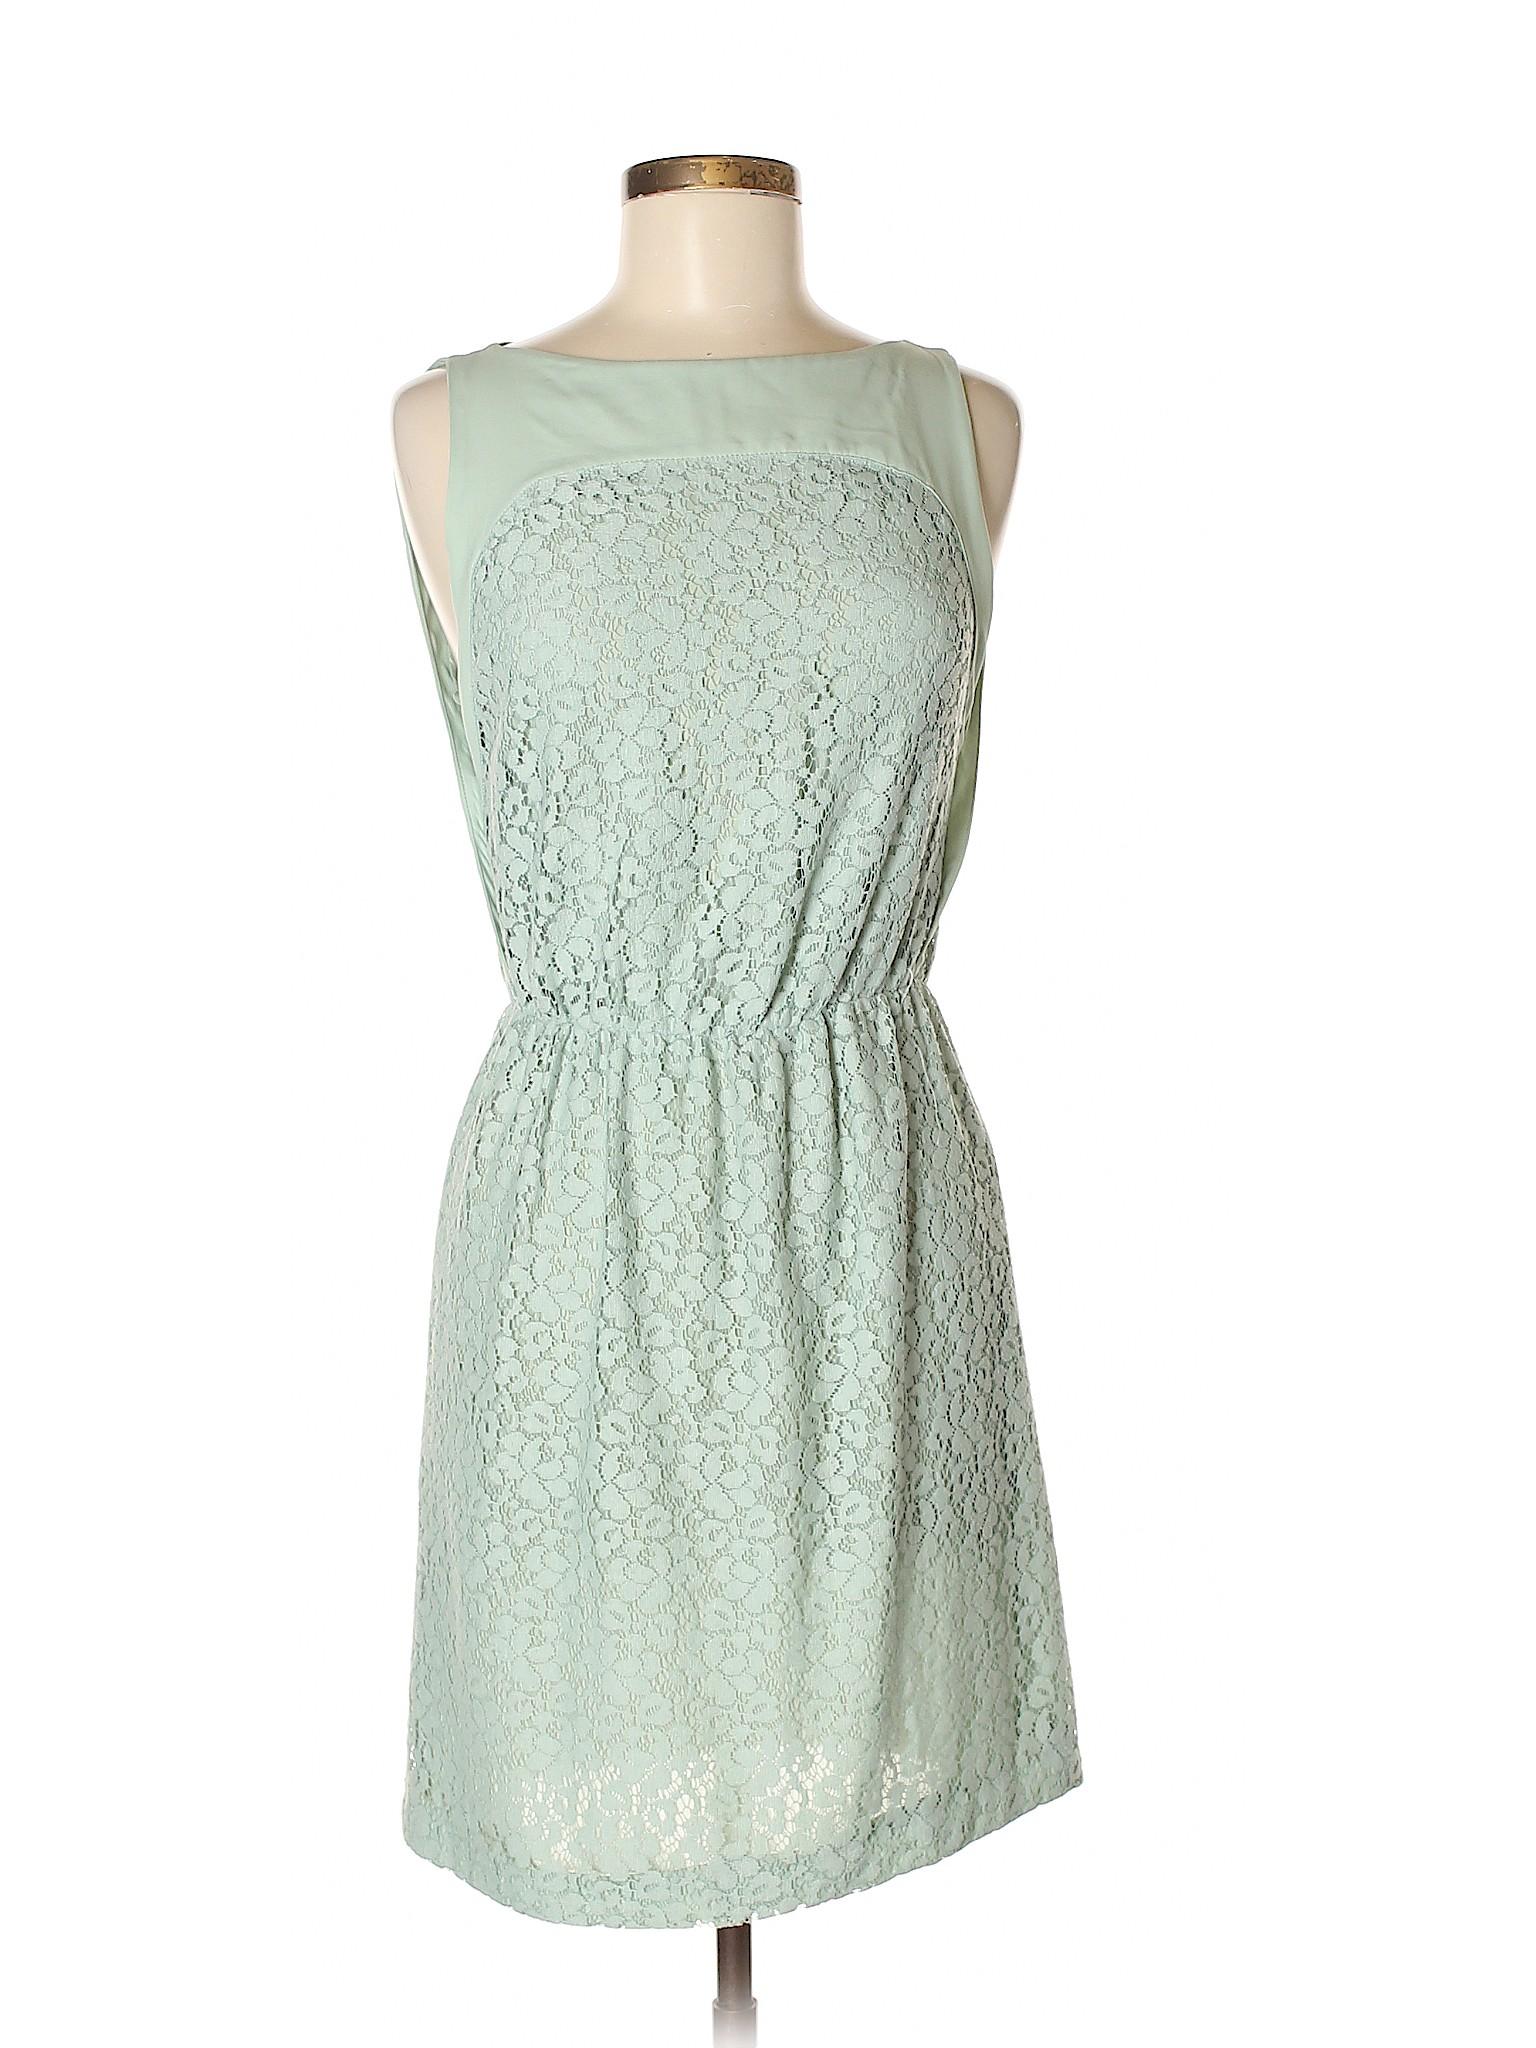 Zara Casual Boutique winter Dress Boutique winter xCPIz